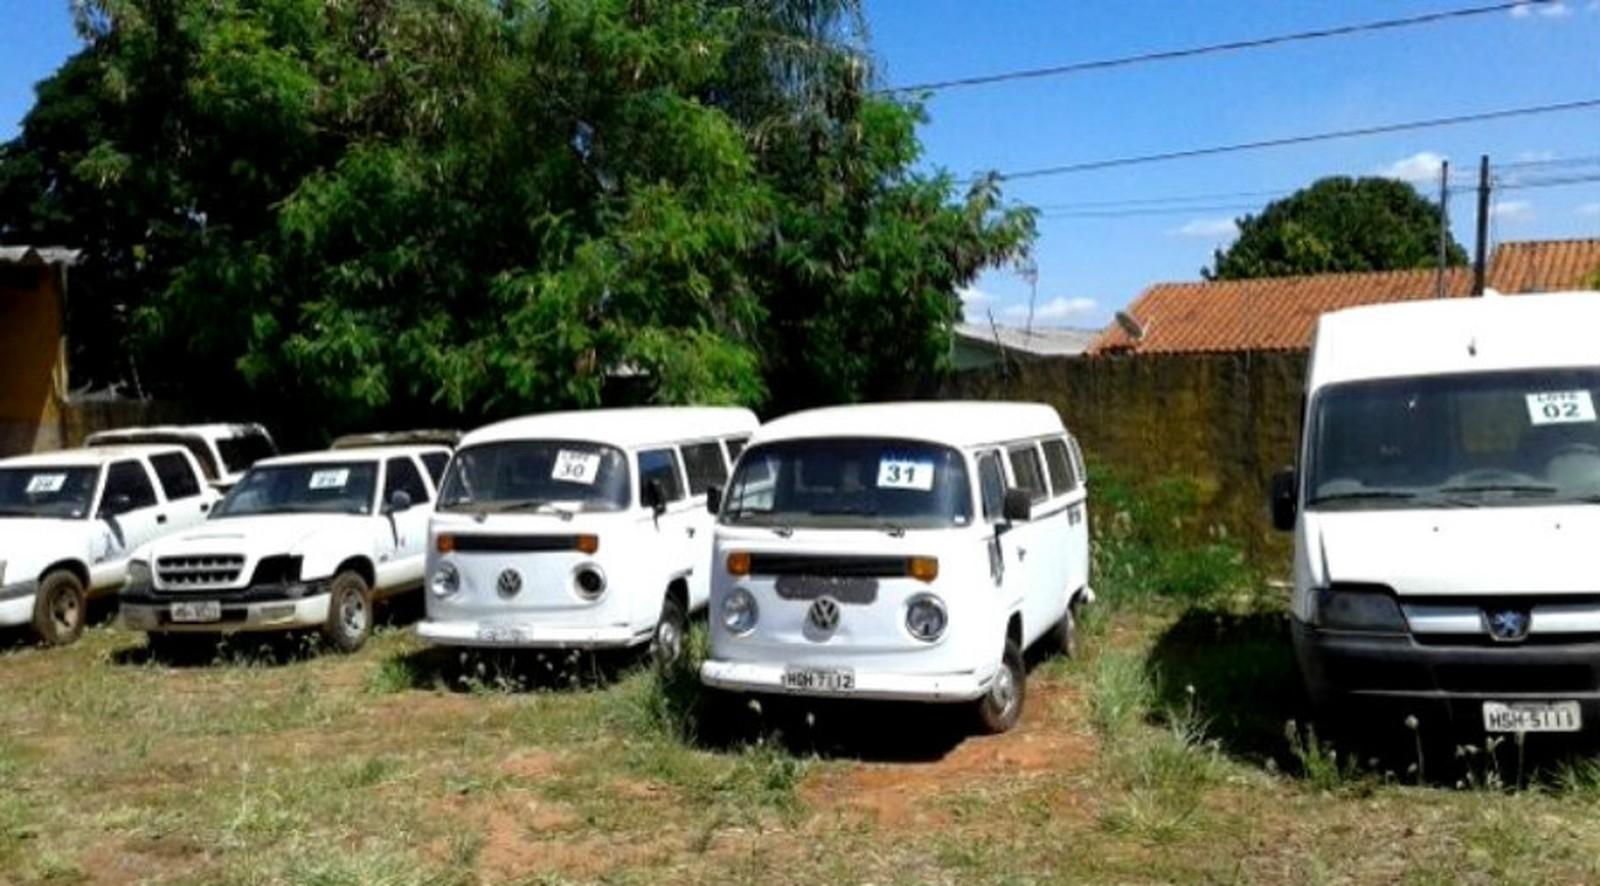 Ao todo são ofertados 43 lotes, sendo, 38 de veículos para circular e cinco lotes de sucatas de veículos para desmanche.